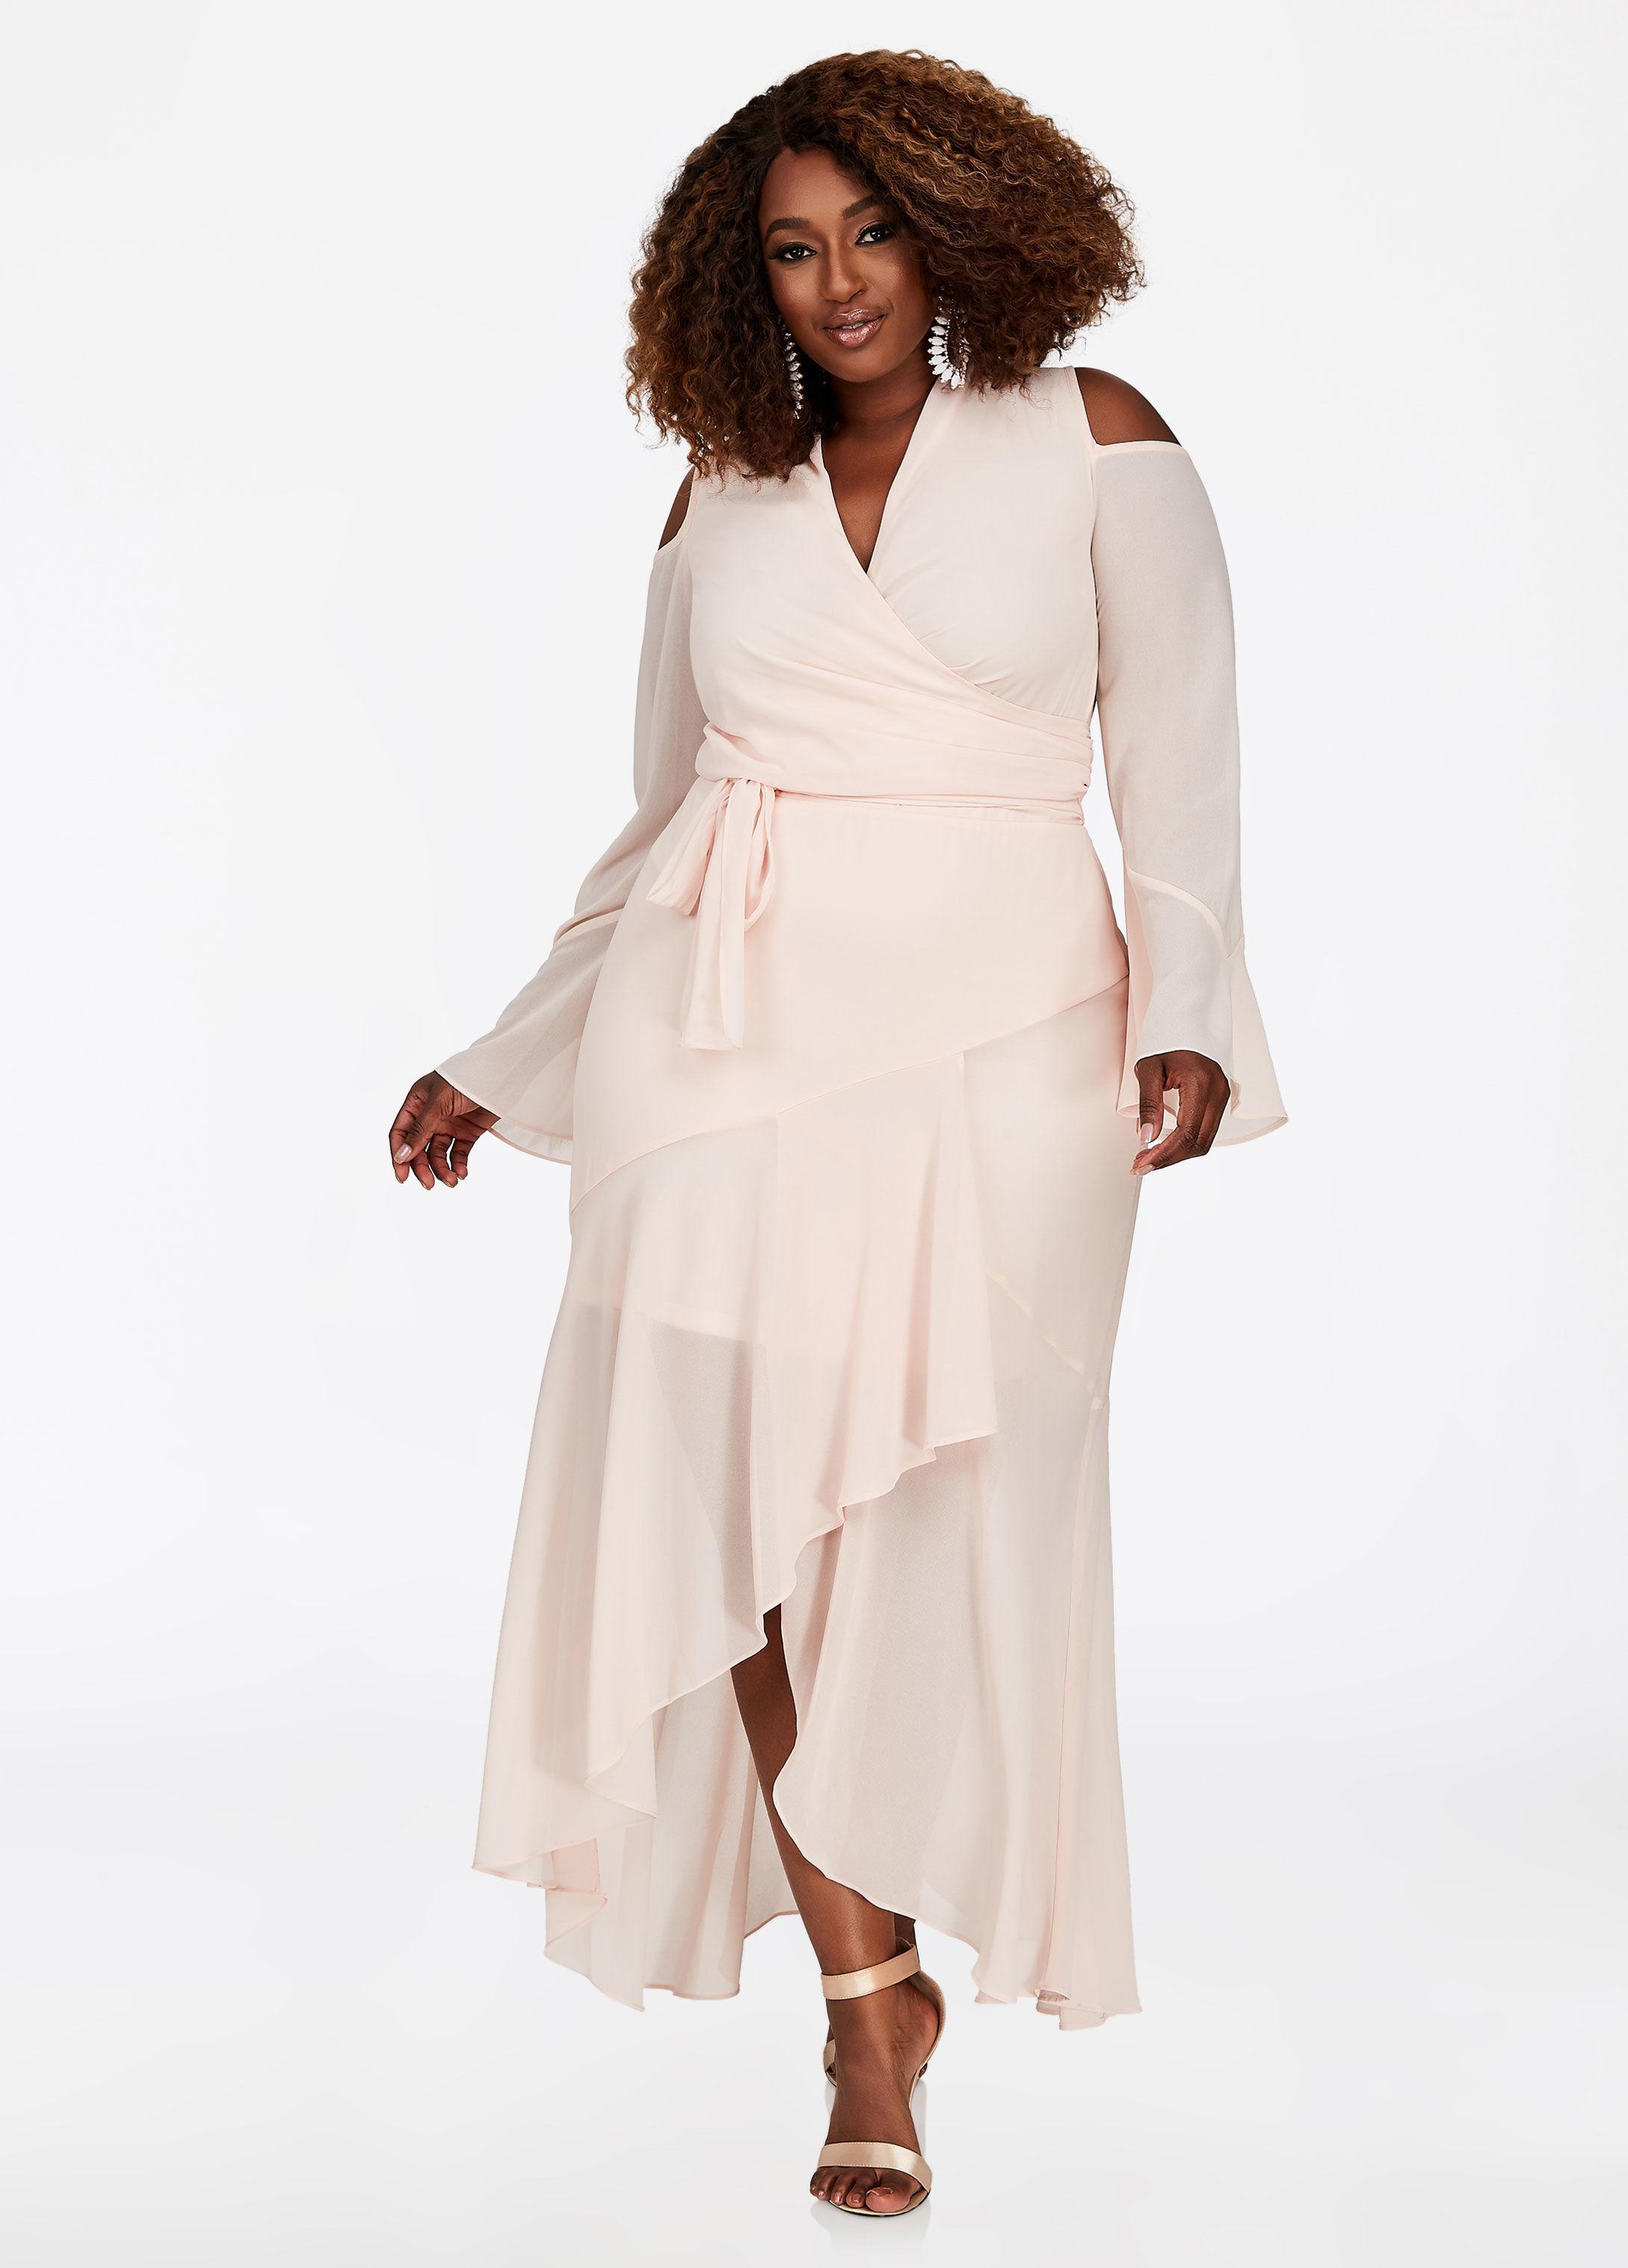 3095275e82d Ashley Stewart Plus Size Bebe Chiffon Belted Maxi Dress in Pink - Lyst